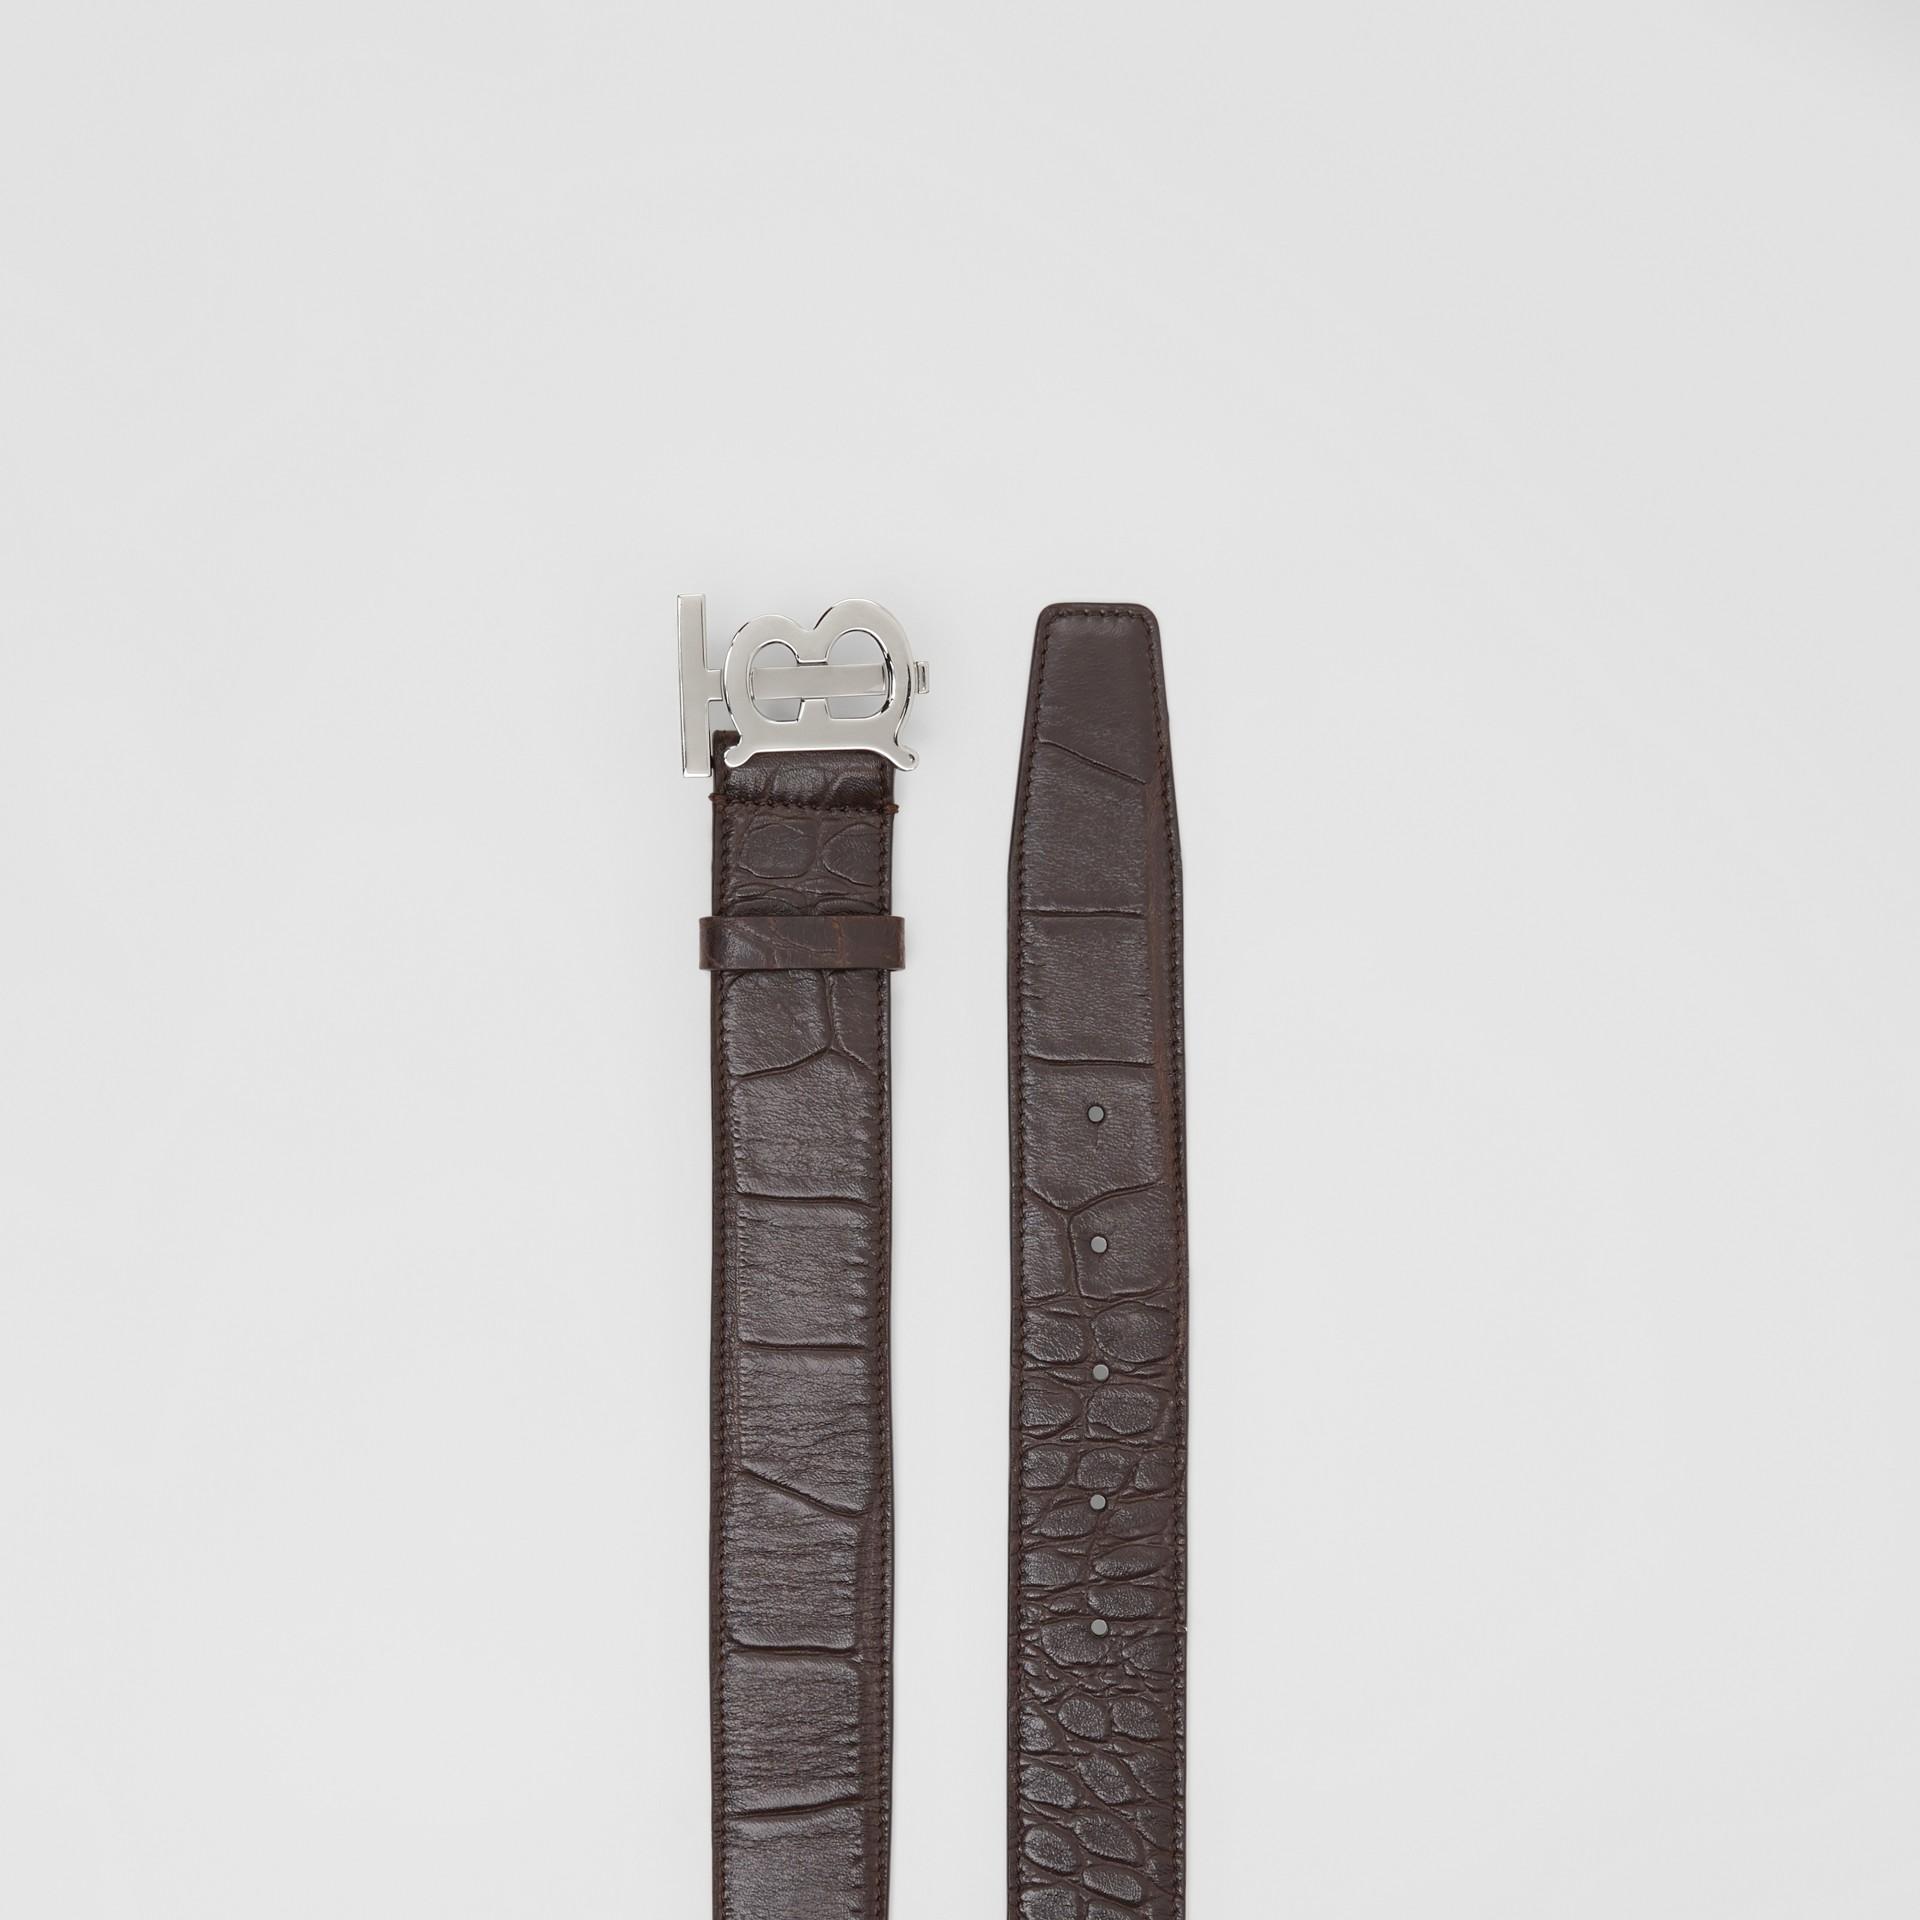 Monogram Motif Embossed Leather Belt in Brown - Men | Burberry - gallery image 5